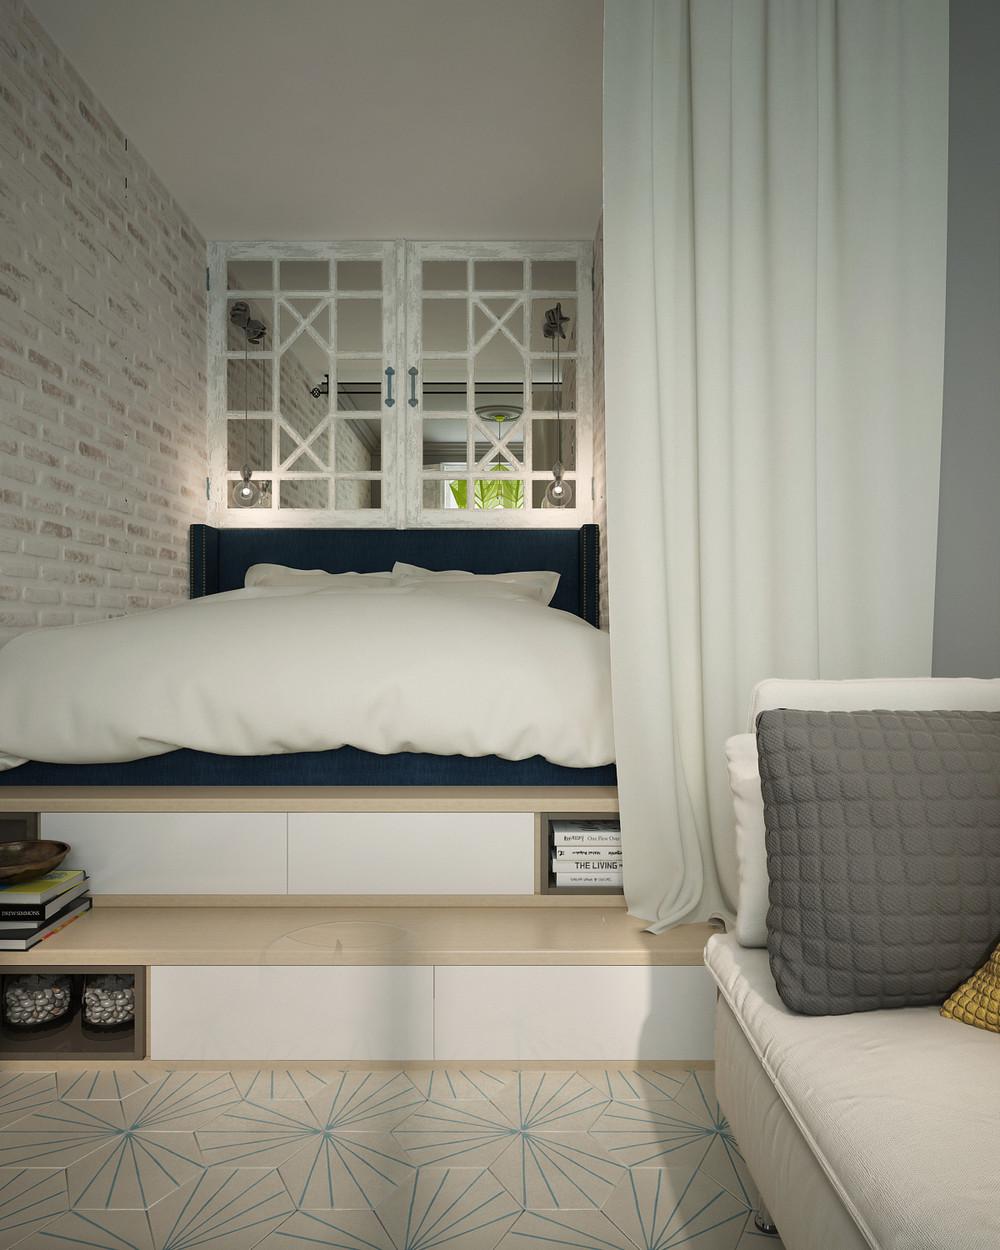 Soft bedroom design for minimalist apartment